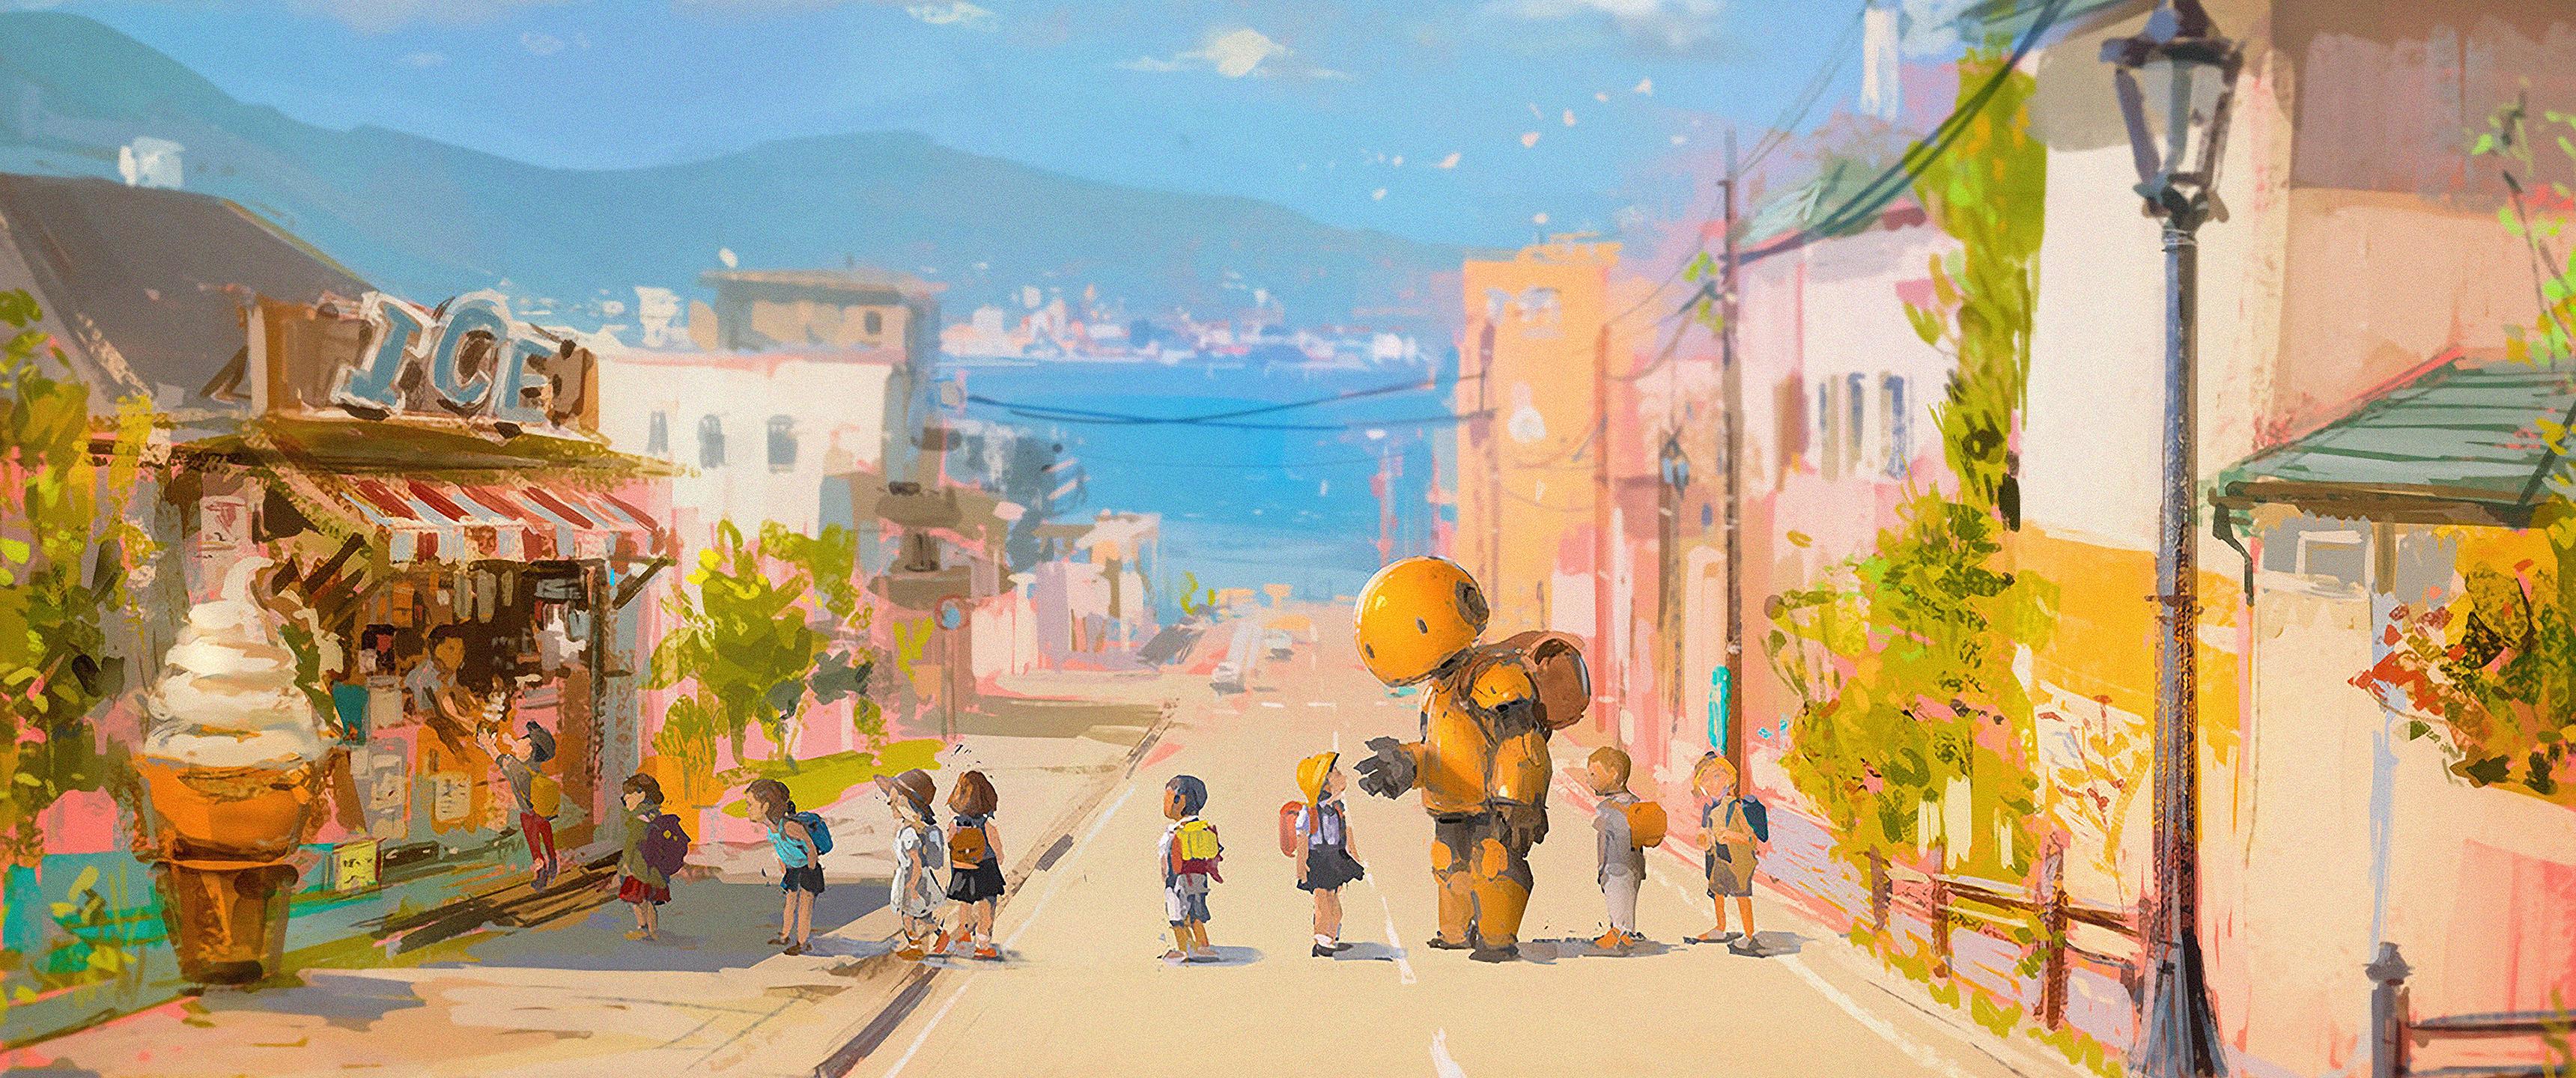 Anime 3440x1440 street robot beach sea children anime ultrawide ultra-wide